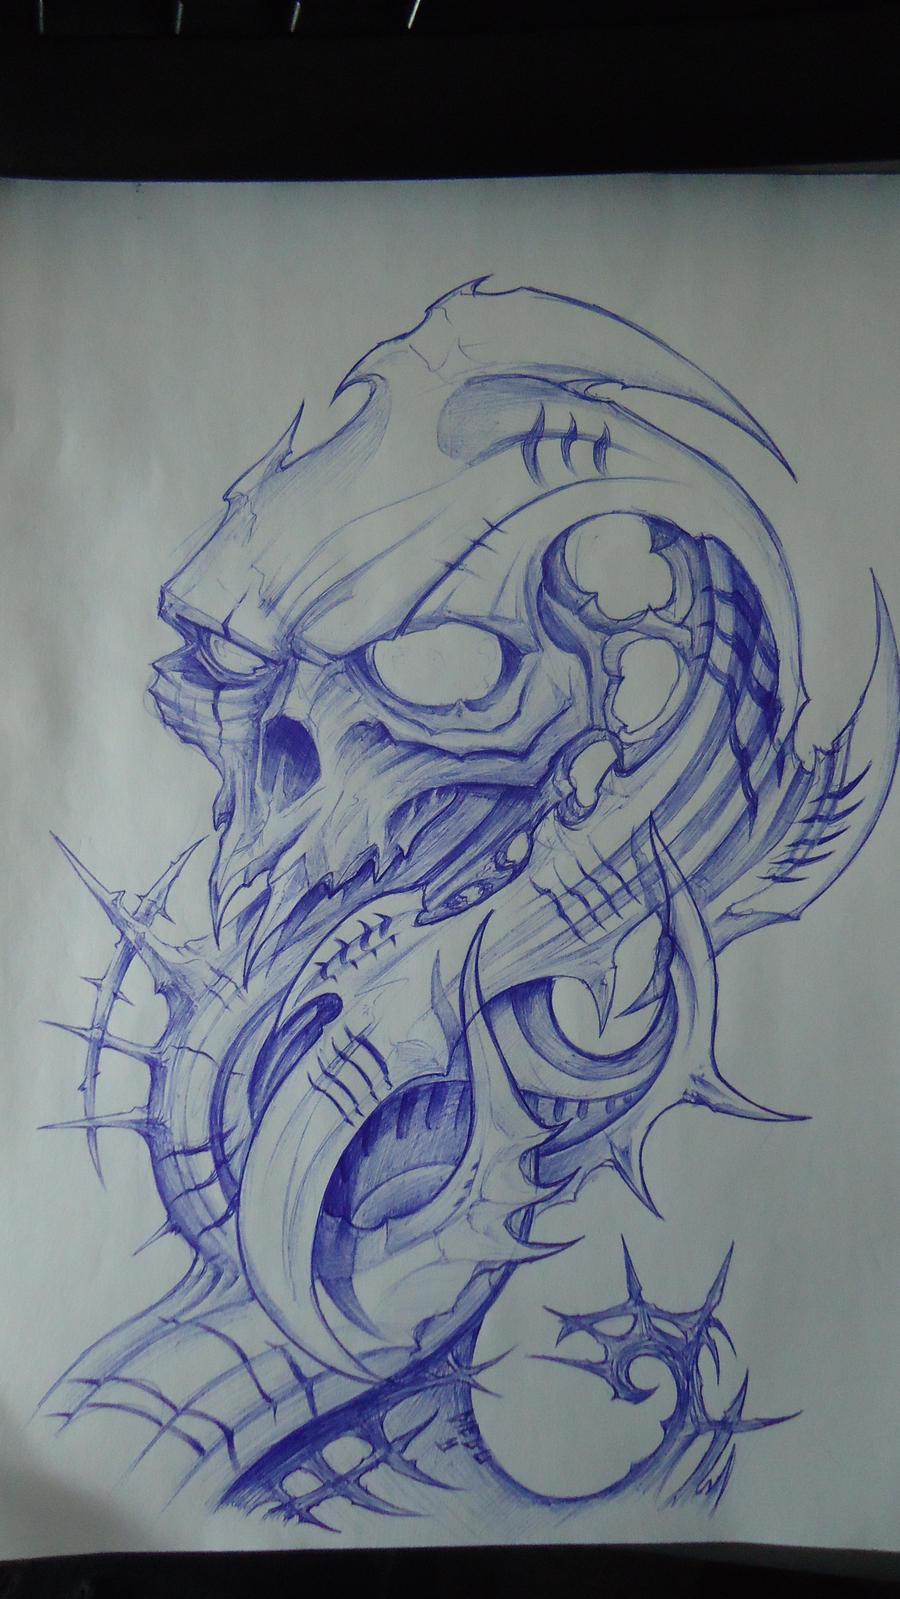 biomech skull design by DiegoCT92